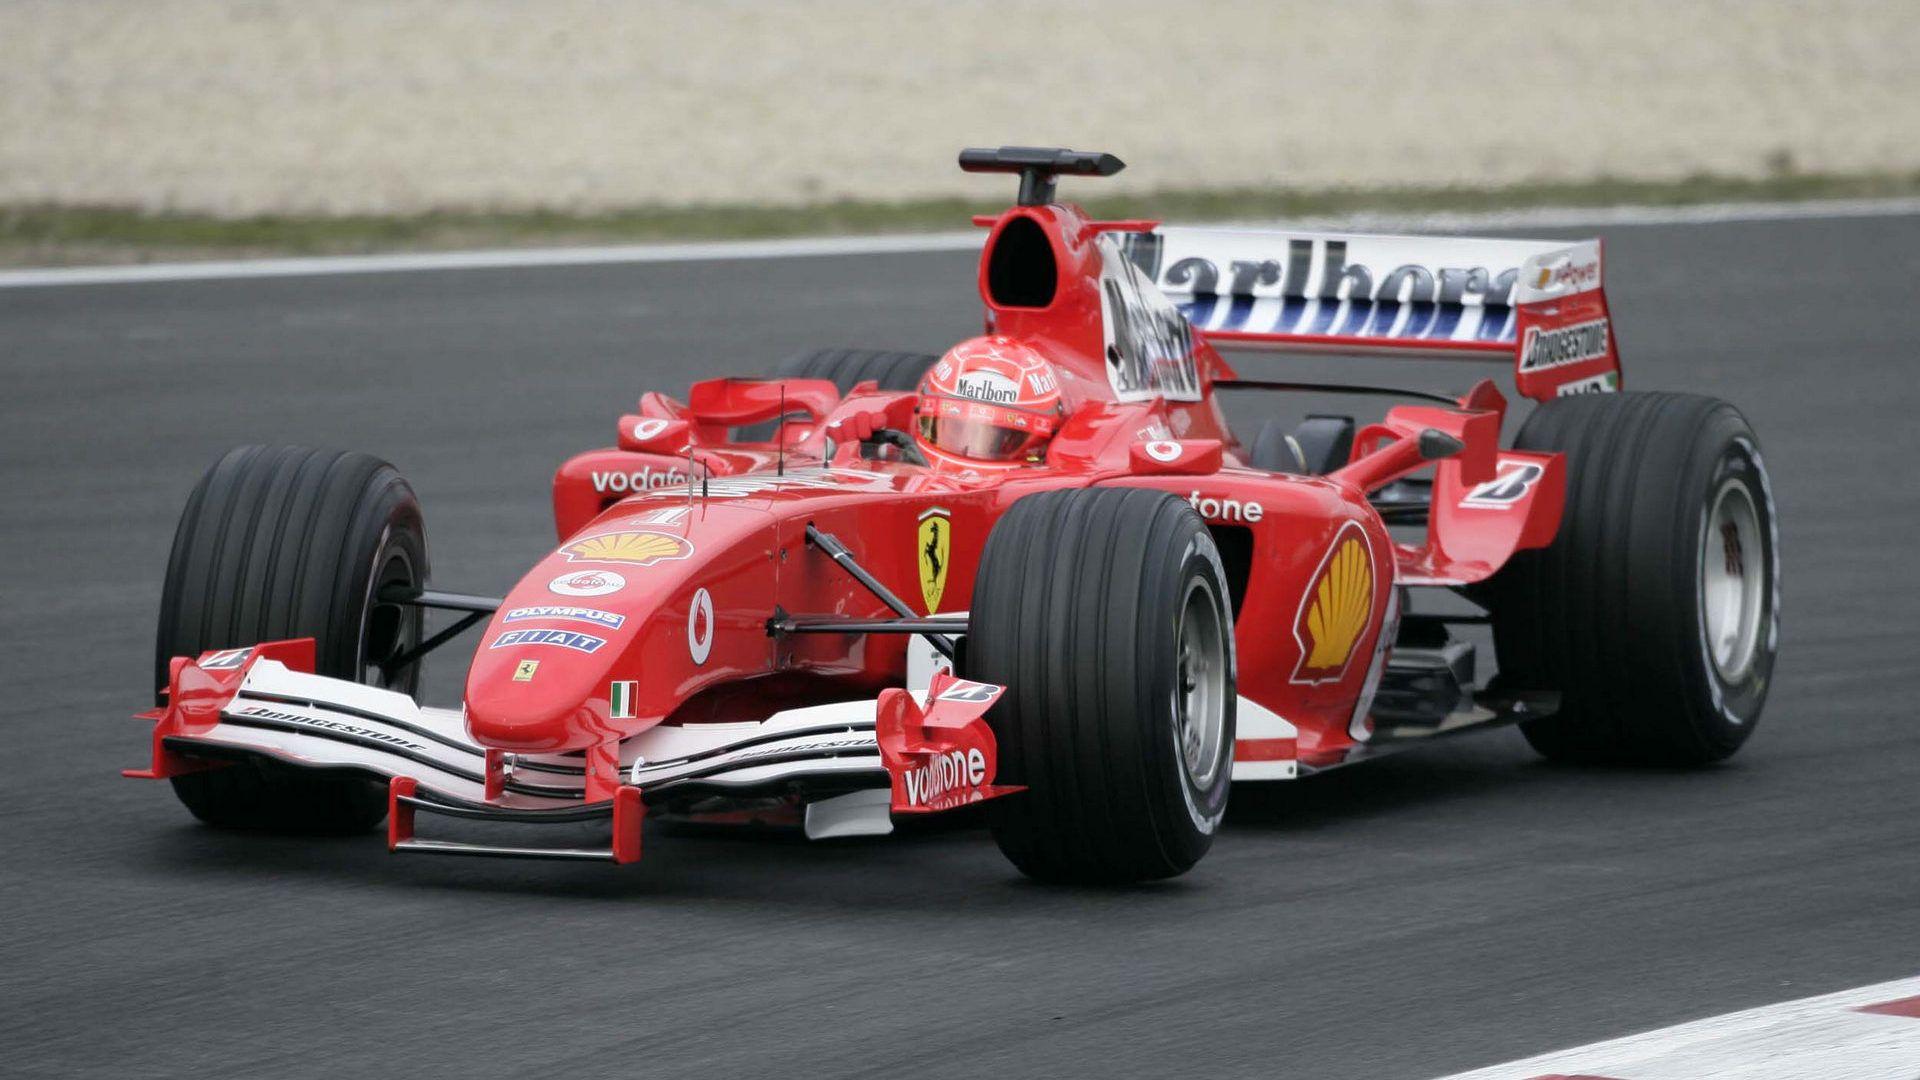 2005 Ferrari F2004M (Michael Schumacher) 2005 Formuła 1